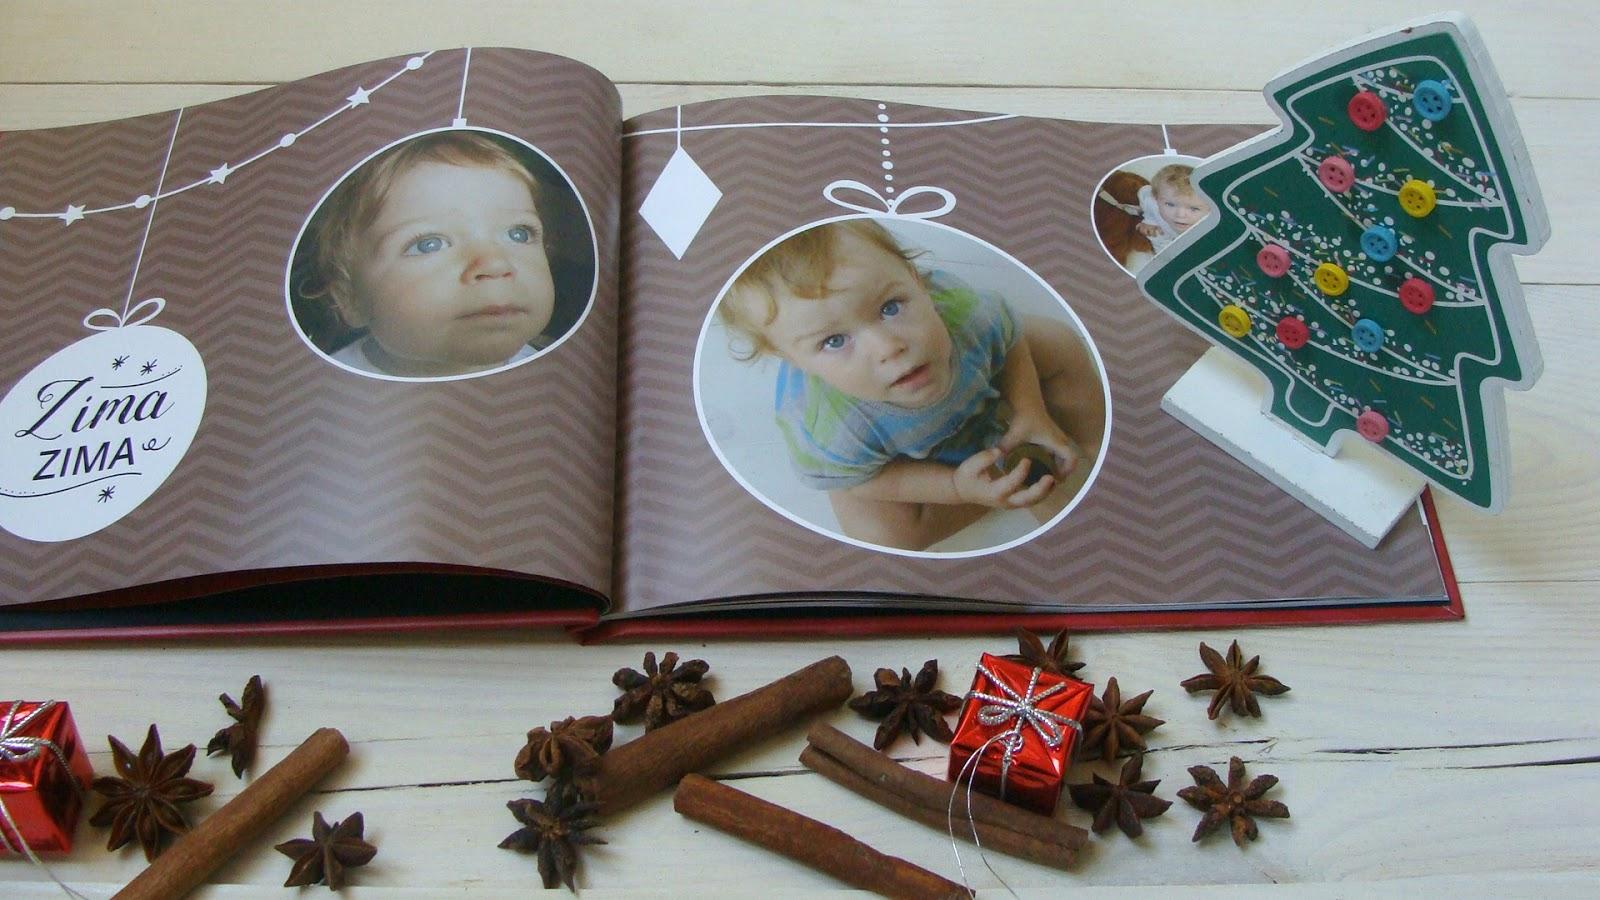 Fotoksiążka printu.pl, prezent na święta